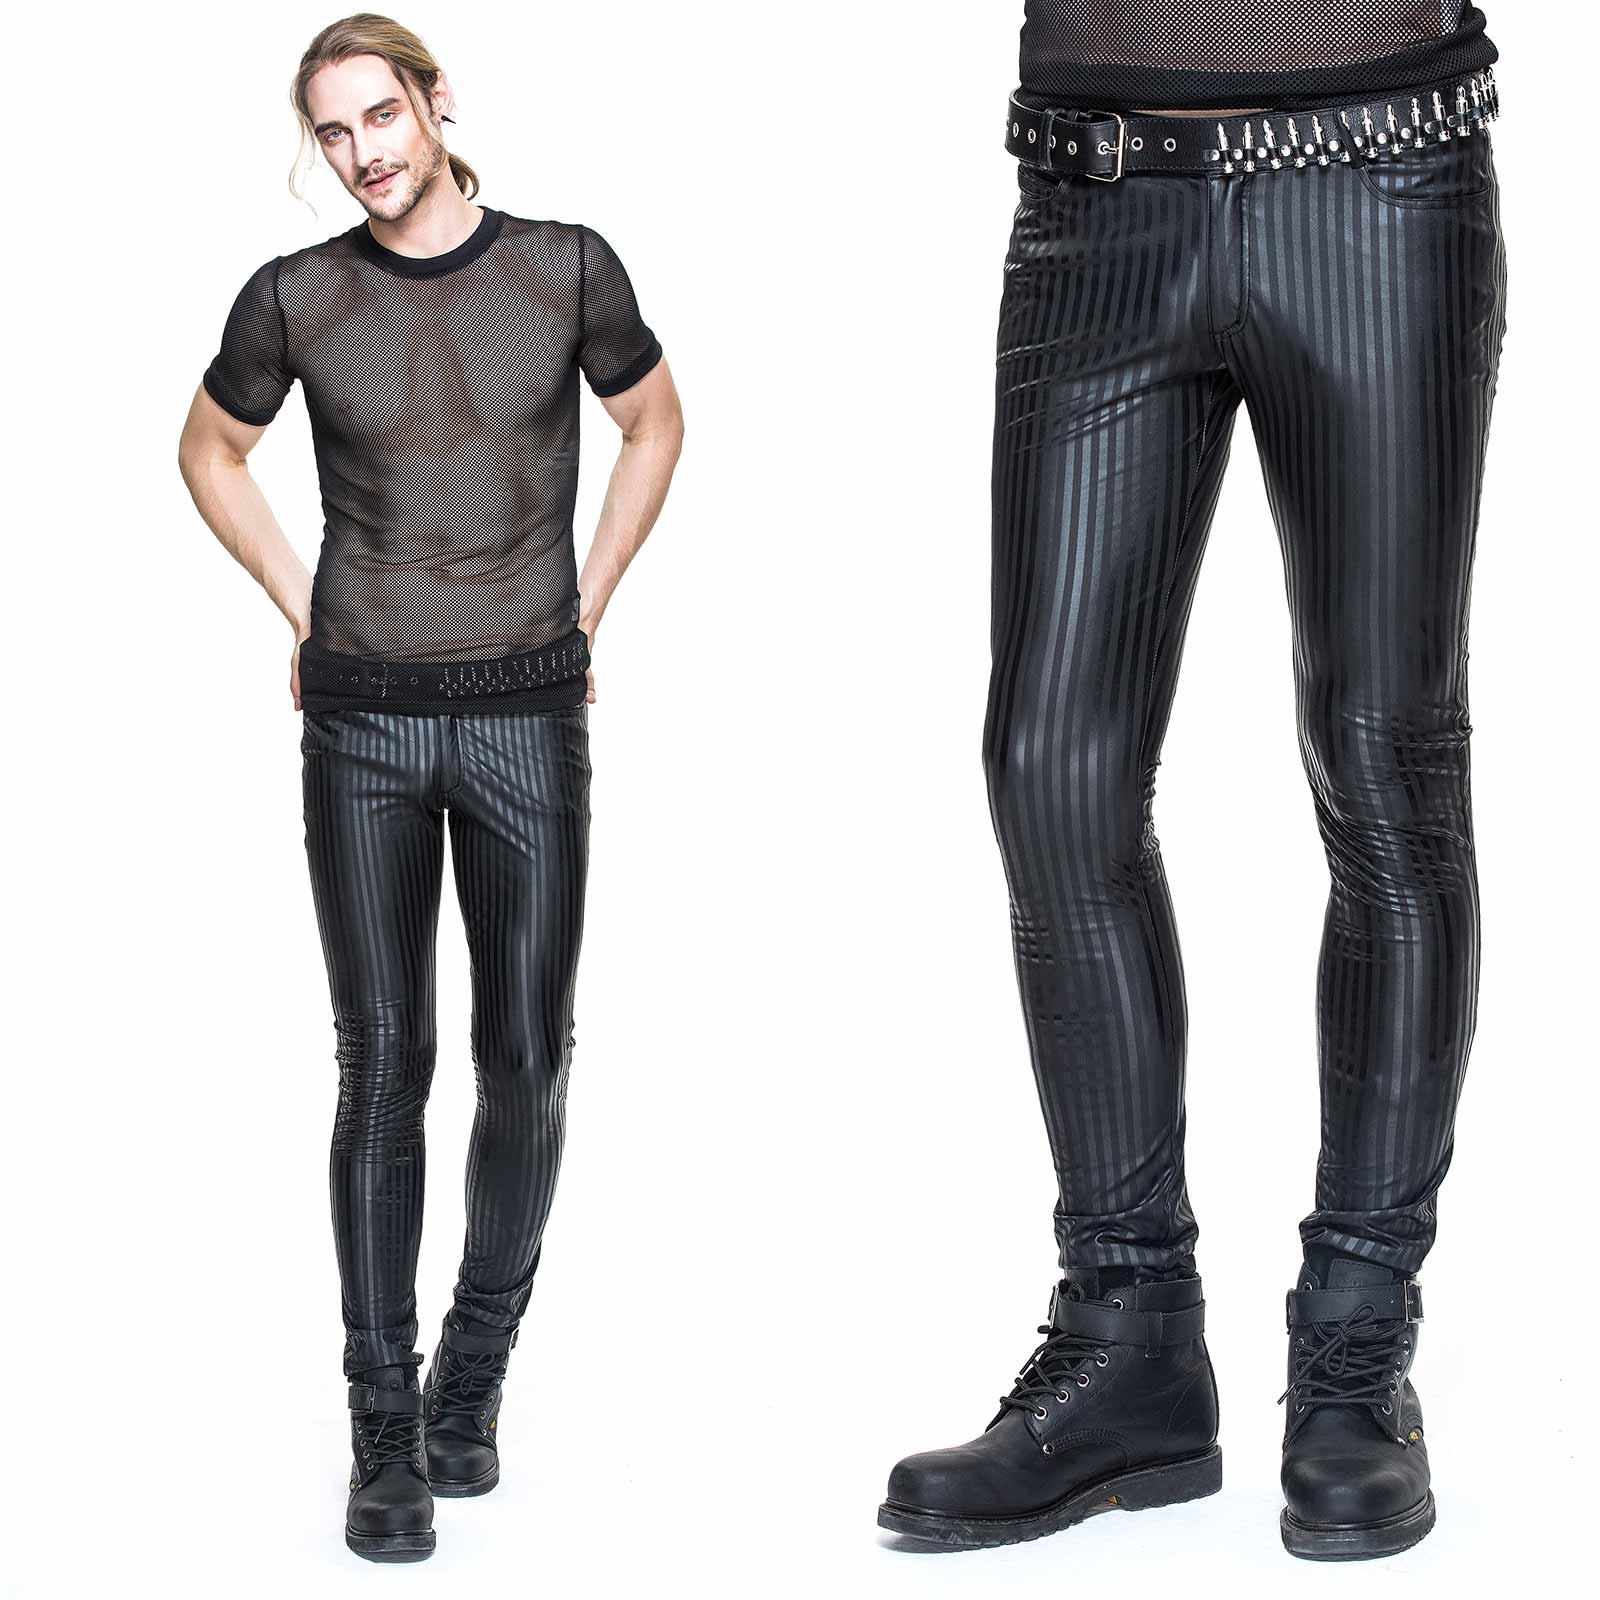 DEVIL FASHION Leatherette Pants Stripes